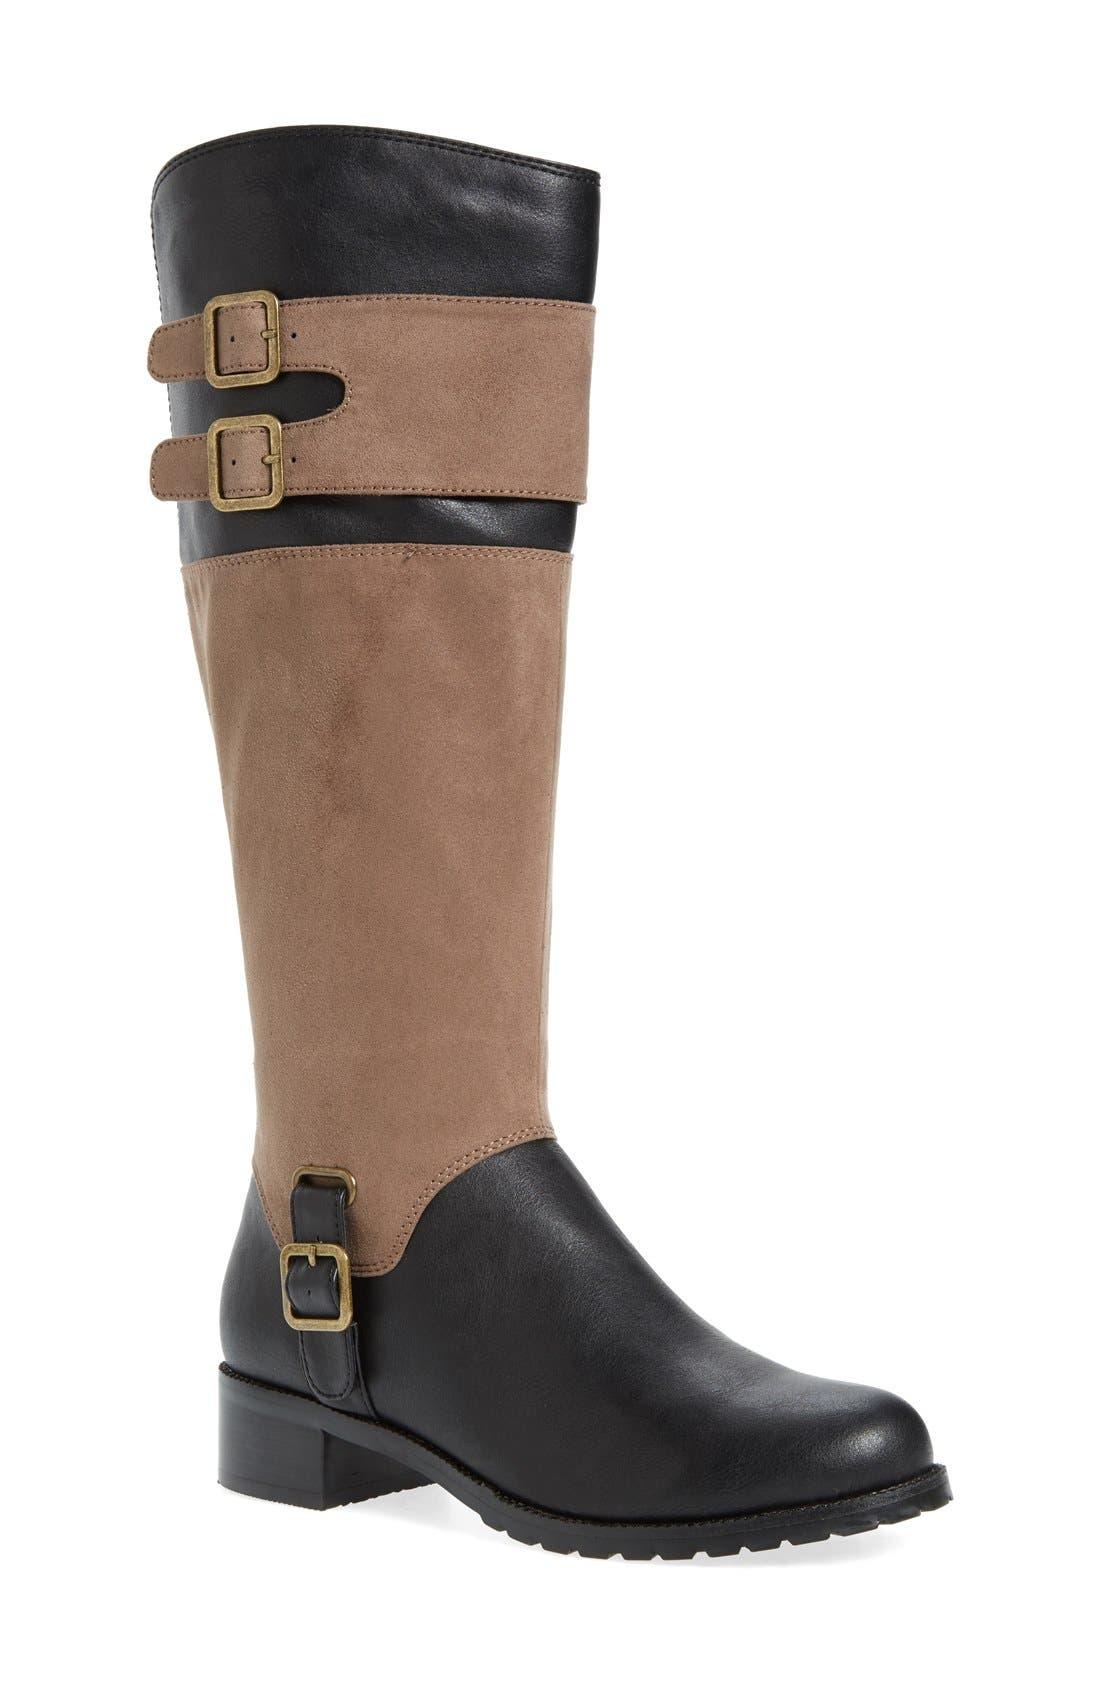 Alternate Image 1 Selected - Bella Vita 'Adriann II' Riding Boot (Women)